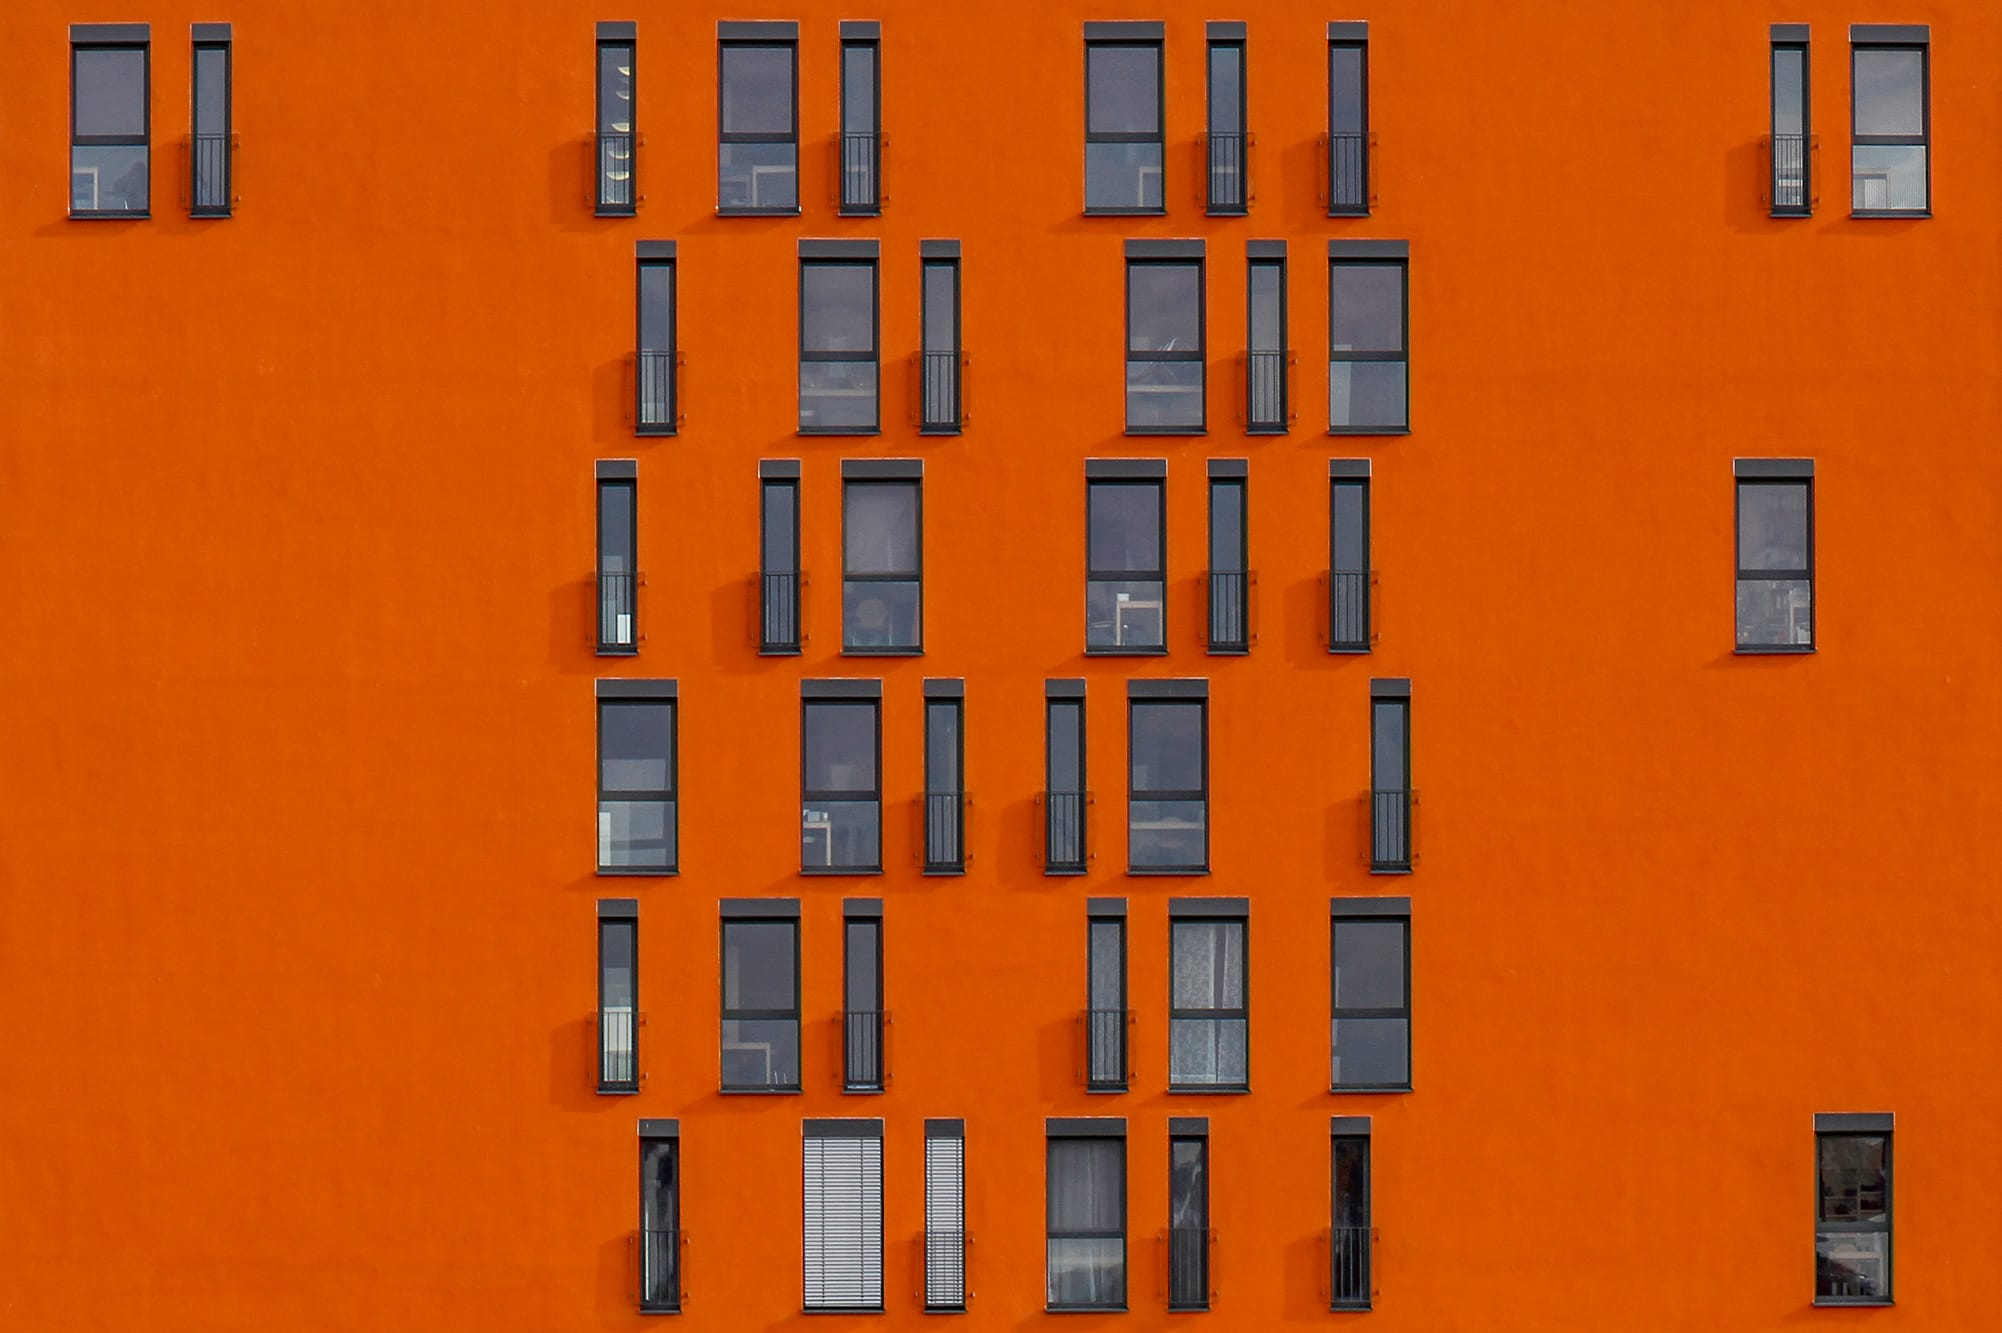 querformat-fotografie - Achim Katzberg - querformat-fotografie_Vitrine_Gehege-003